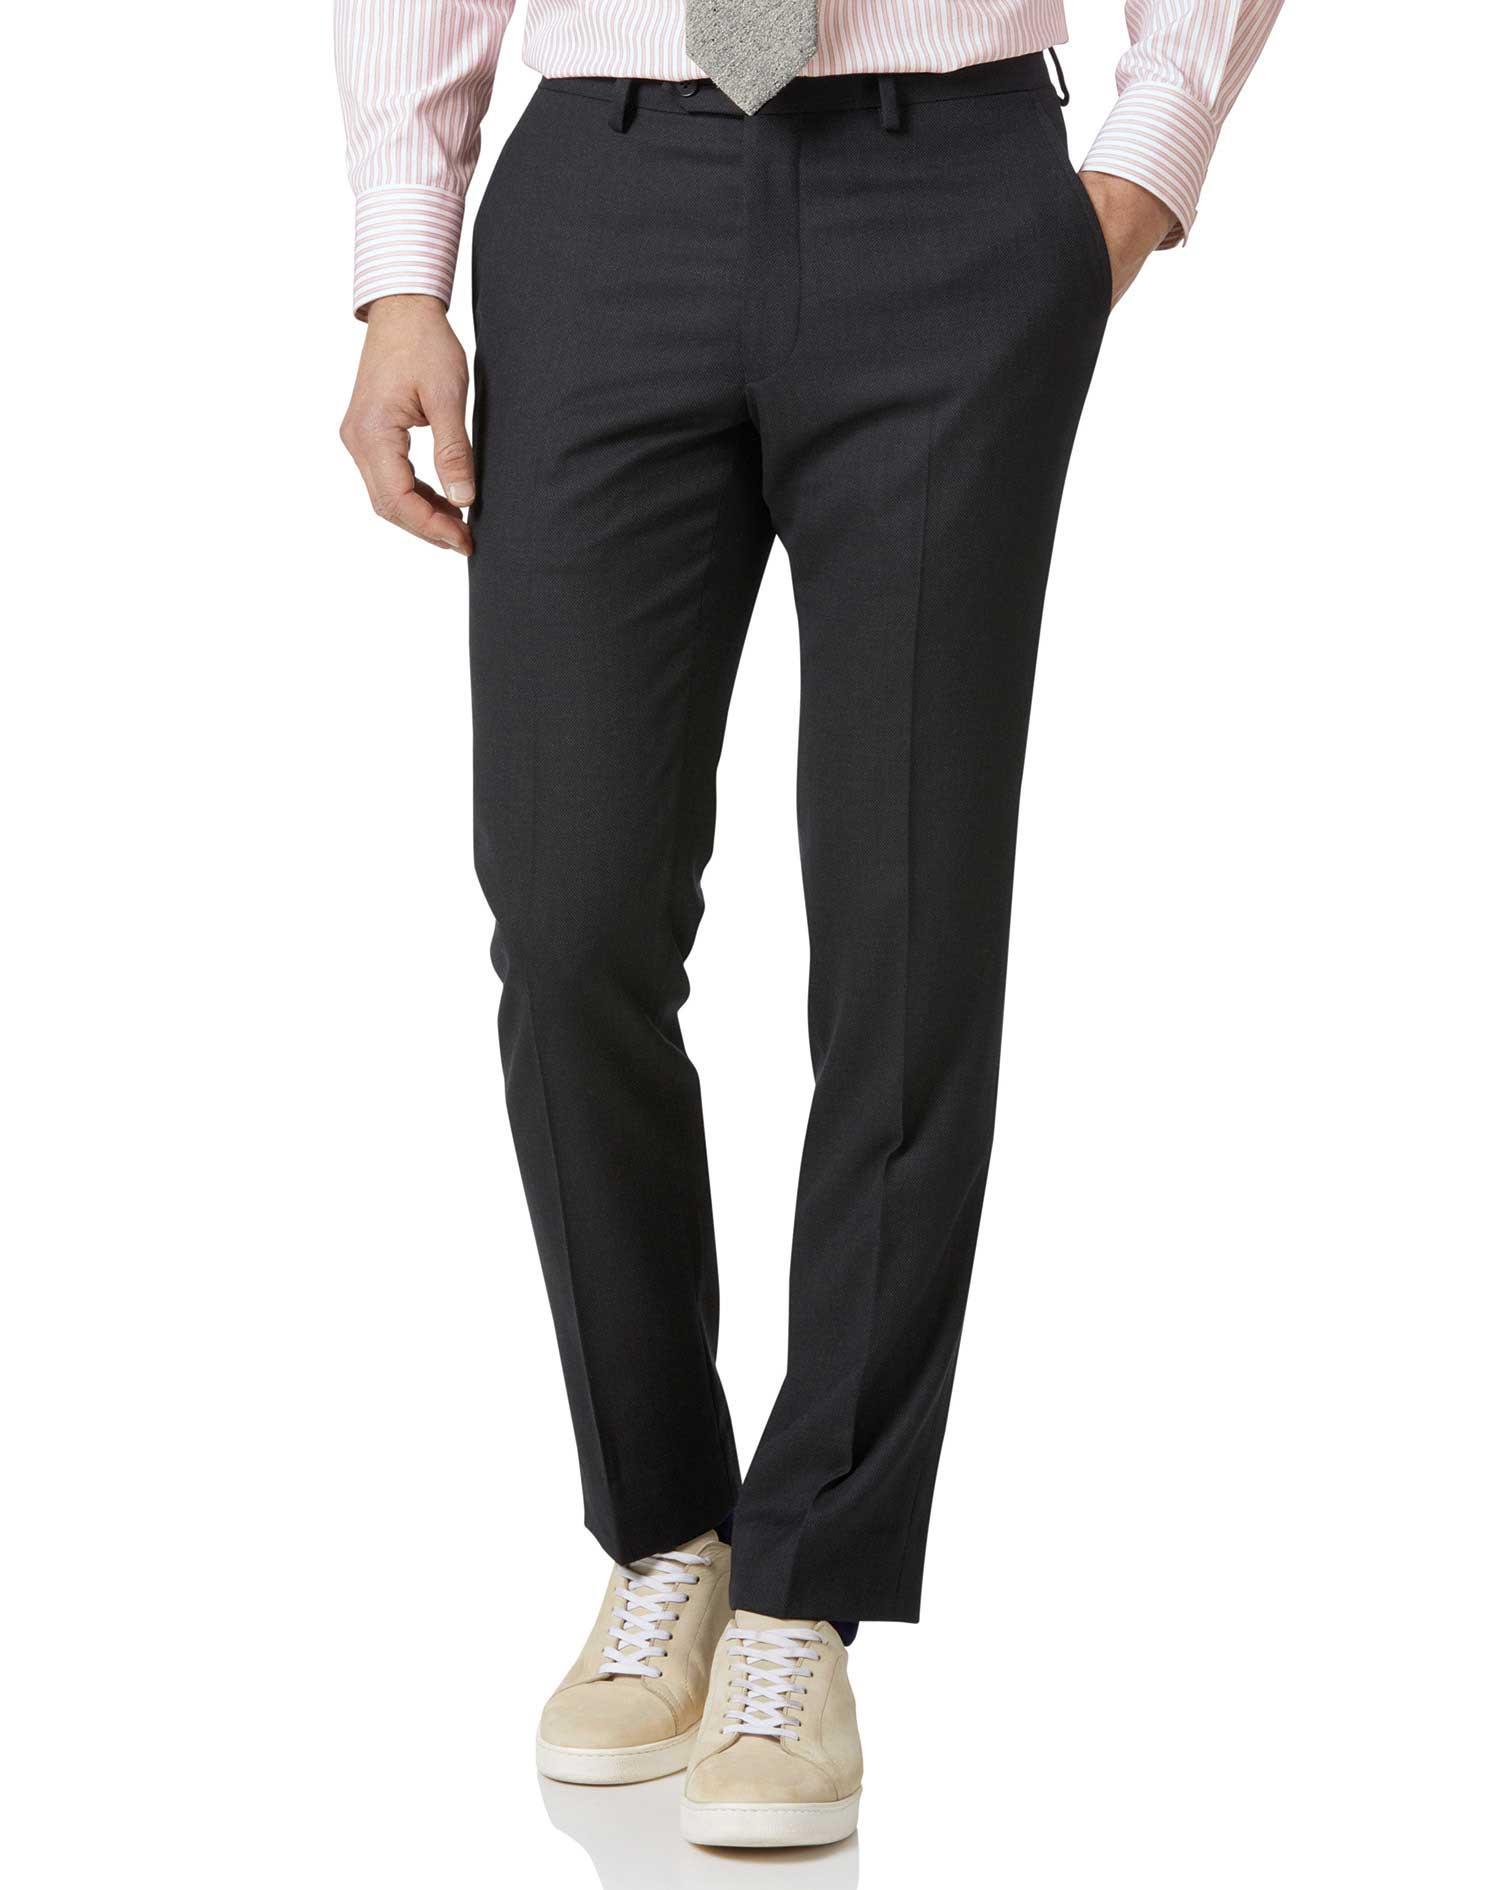 Charcoal Slim Fit Birdseye Travel Suit Trousers Size W42 L32 by Charles Tyrwhitt